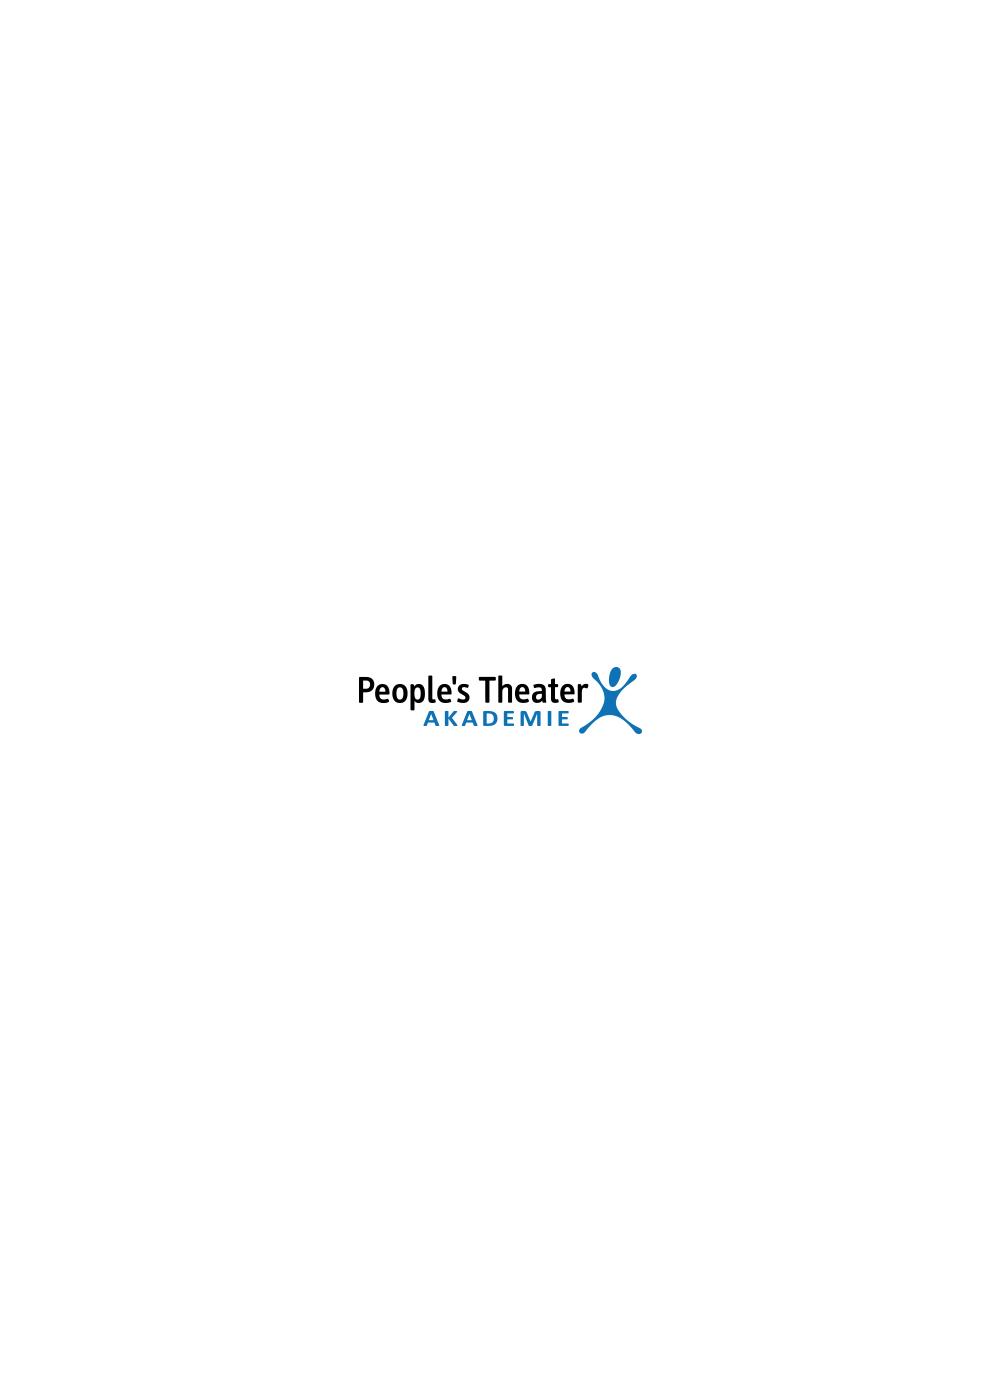 Workpeoplesacademy-Logo